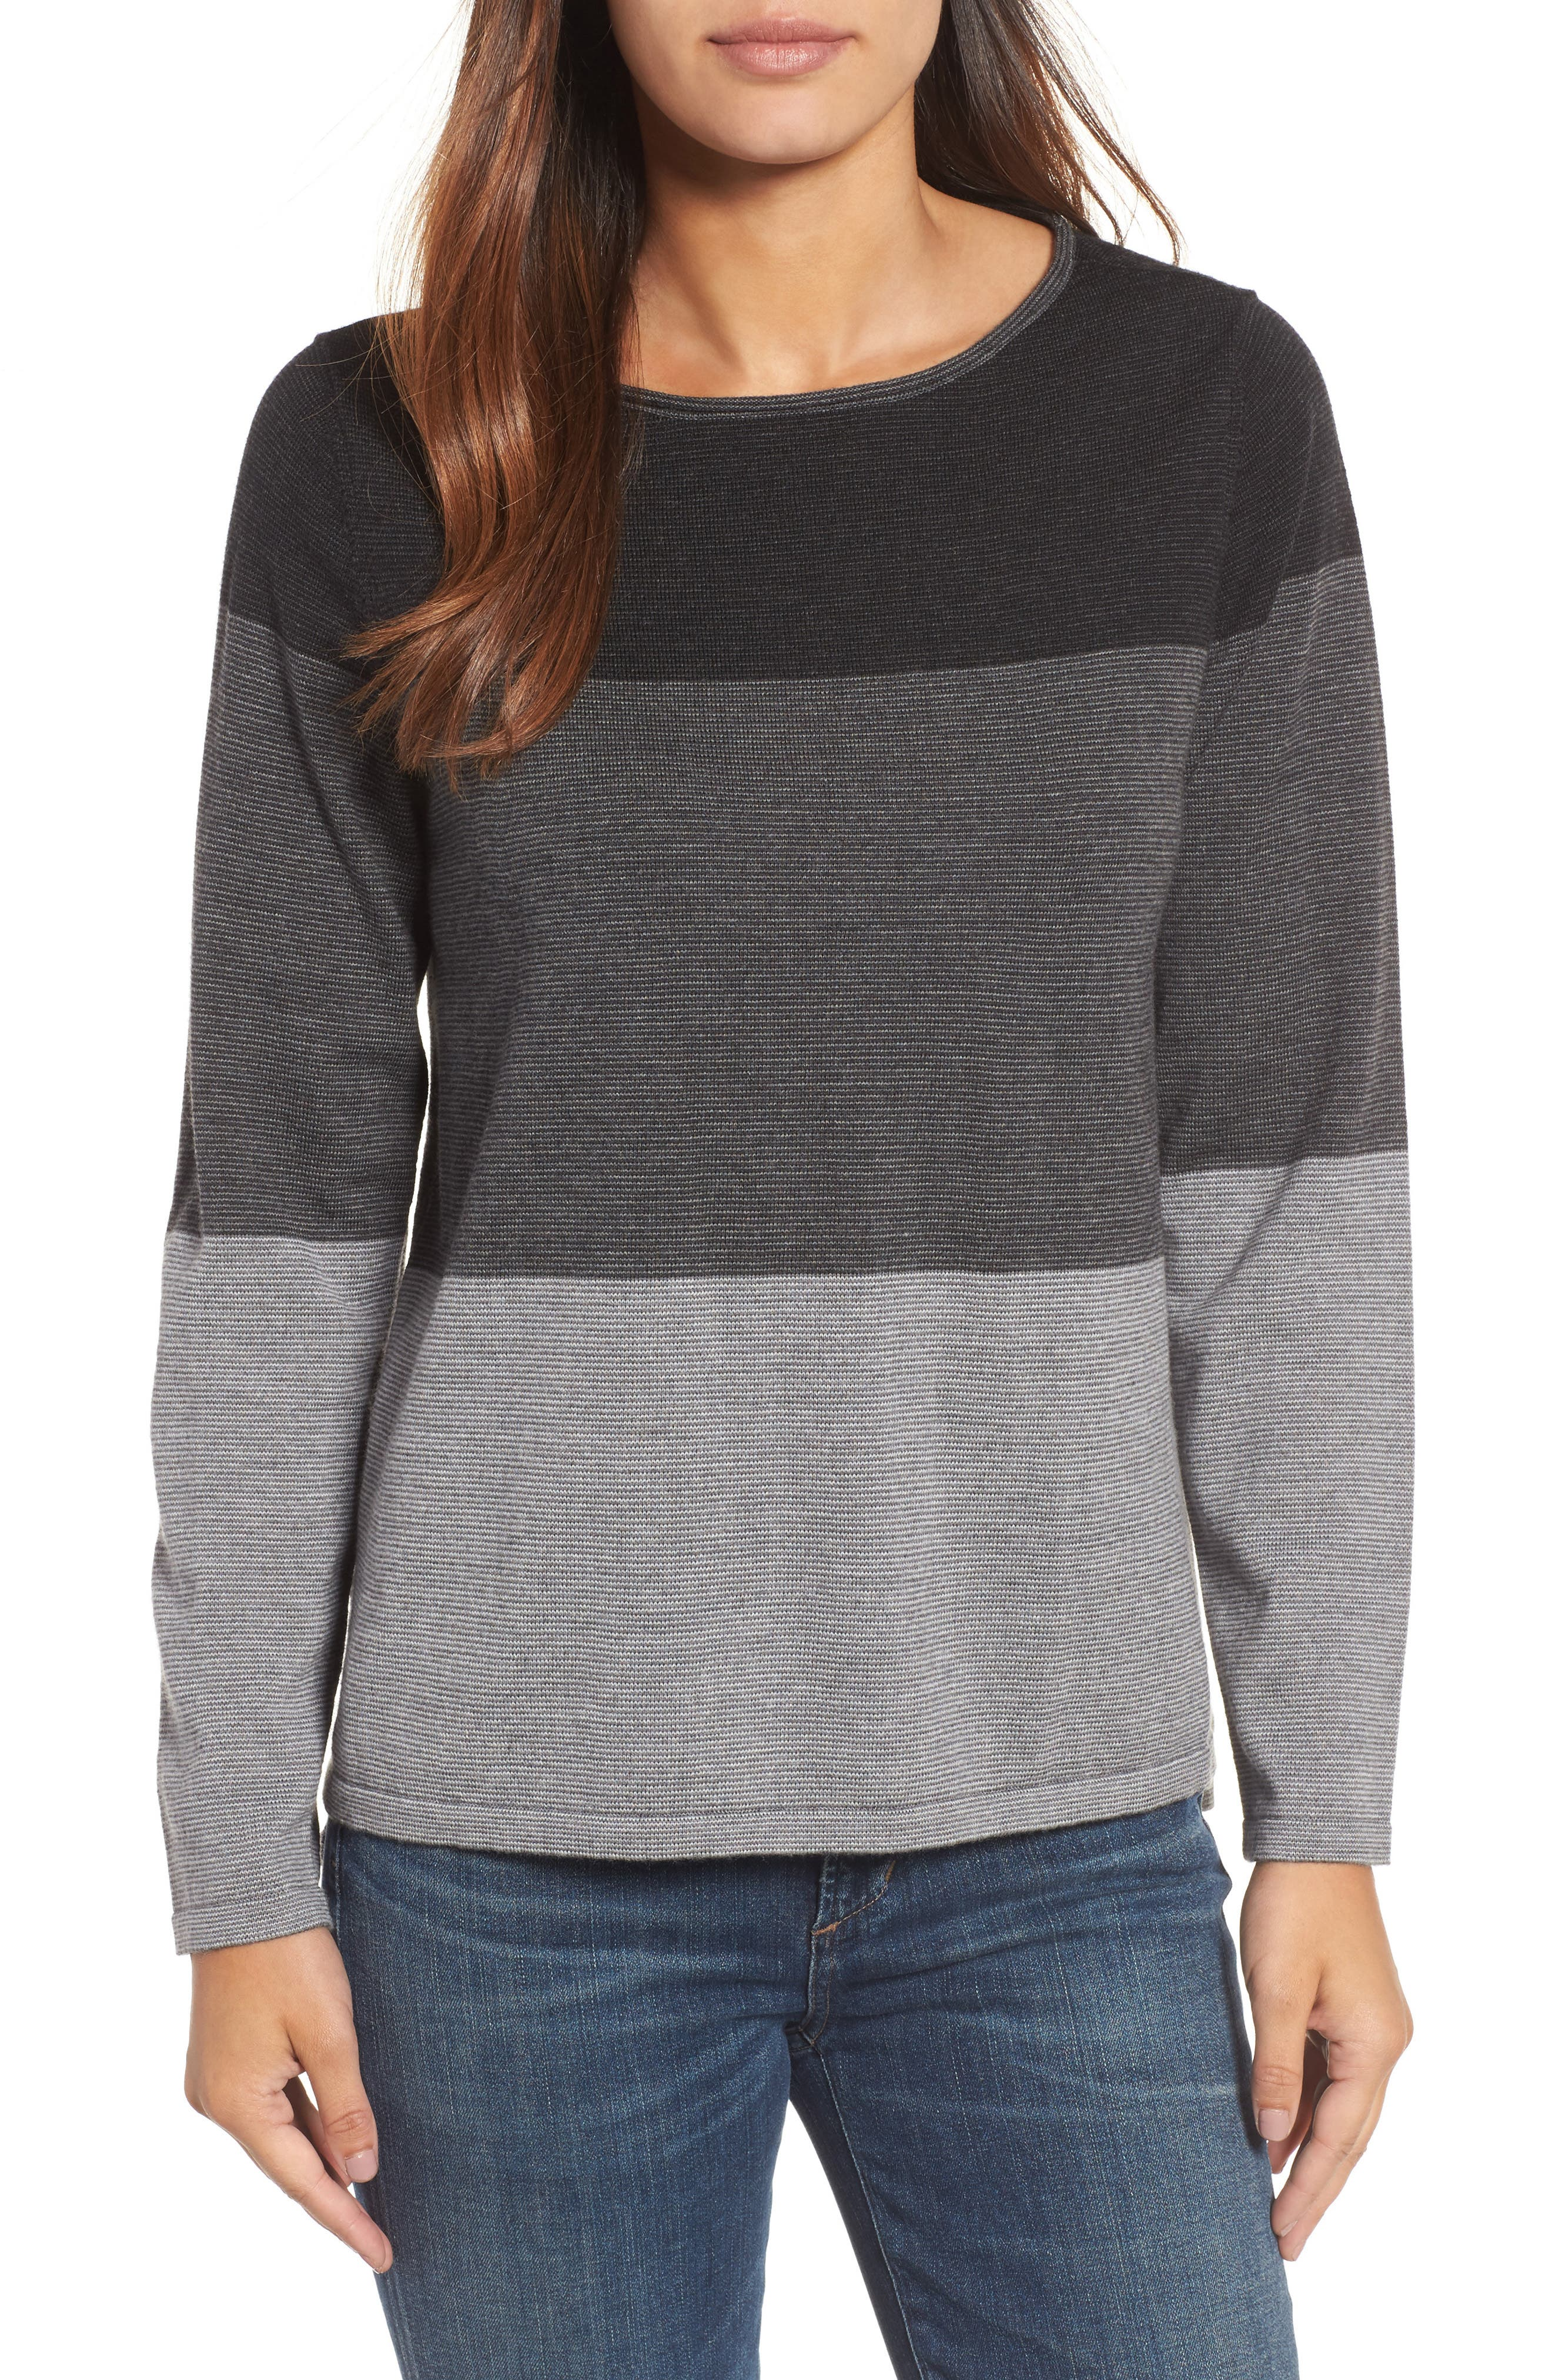 Alternate Image 1 Selected - Eileen Fisher Bateau Neck Stripe Merino Wool Sweater